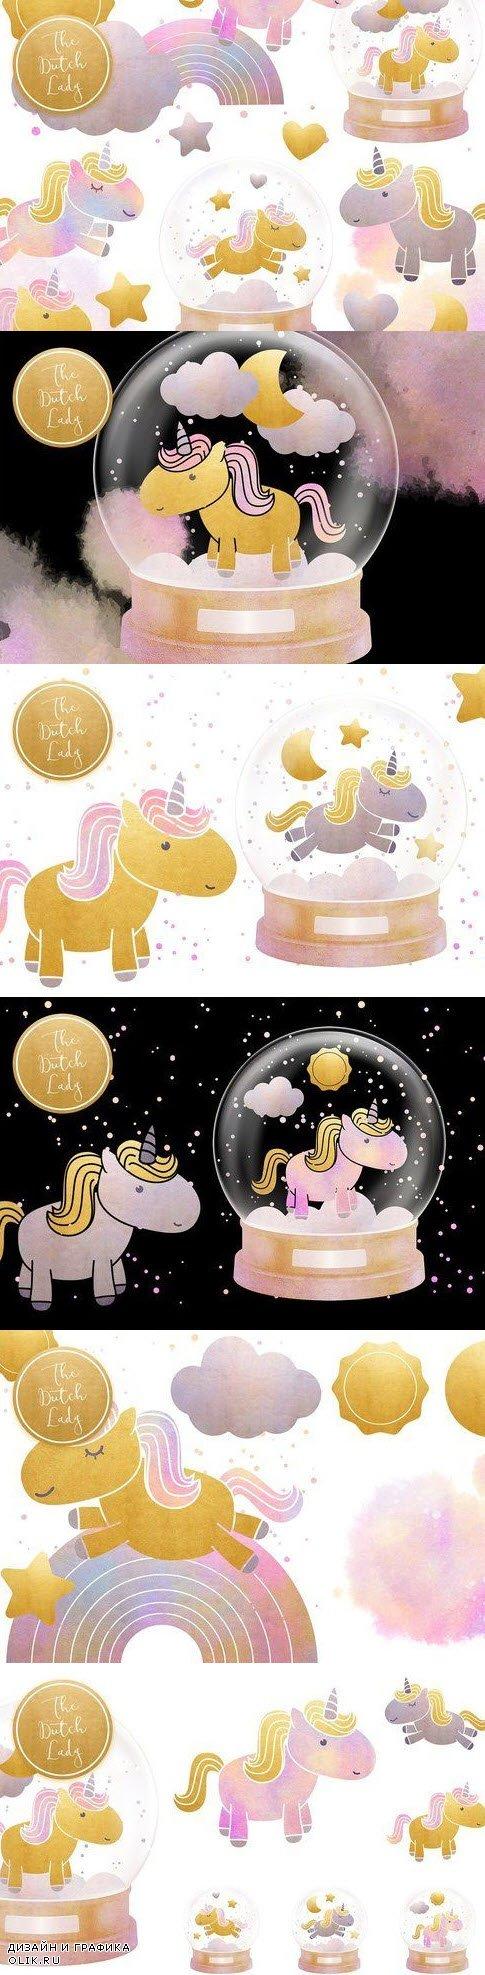 Unicorns & Snowglobe Clipart Set - 4293732